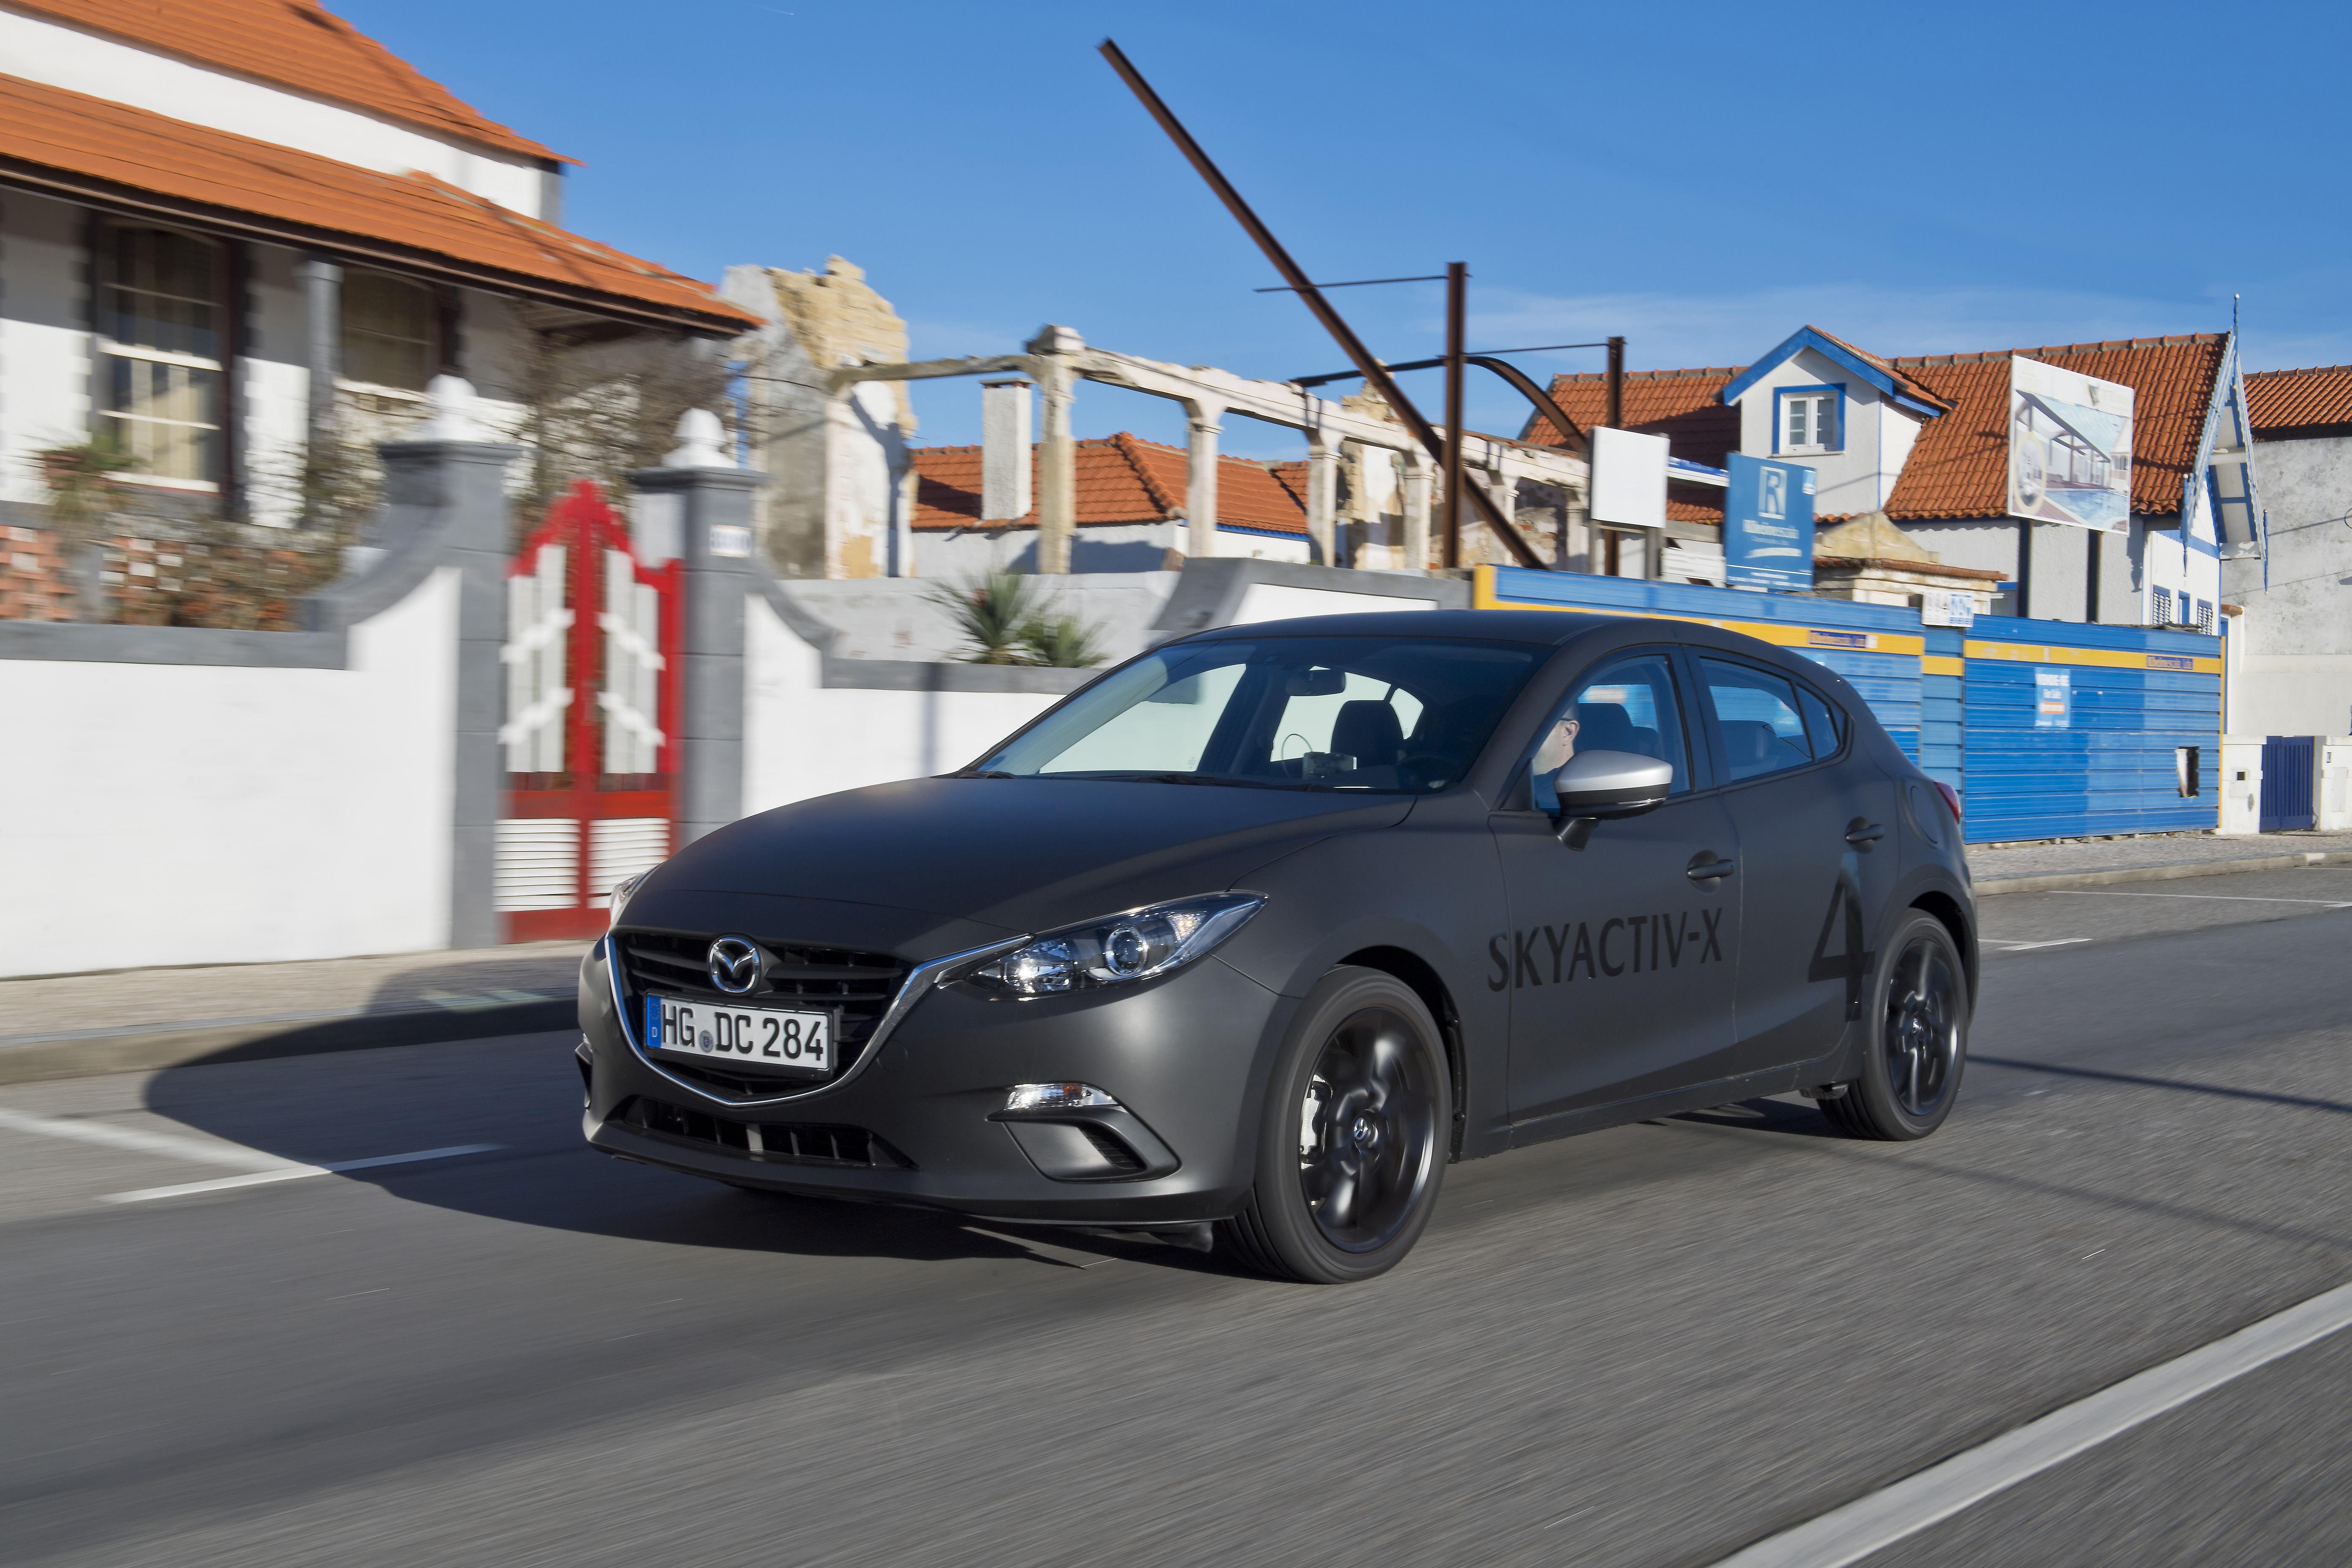 SKYACTIV-X_Porto_Driving_21_hires